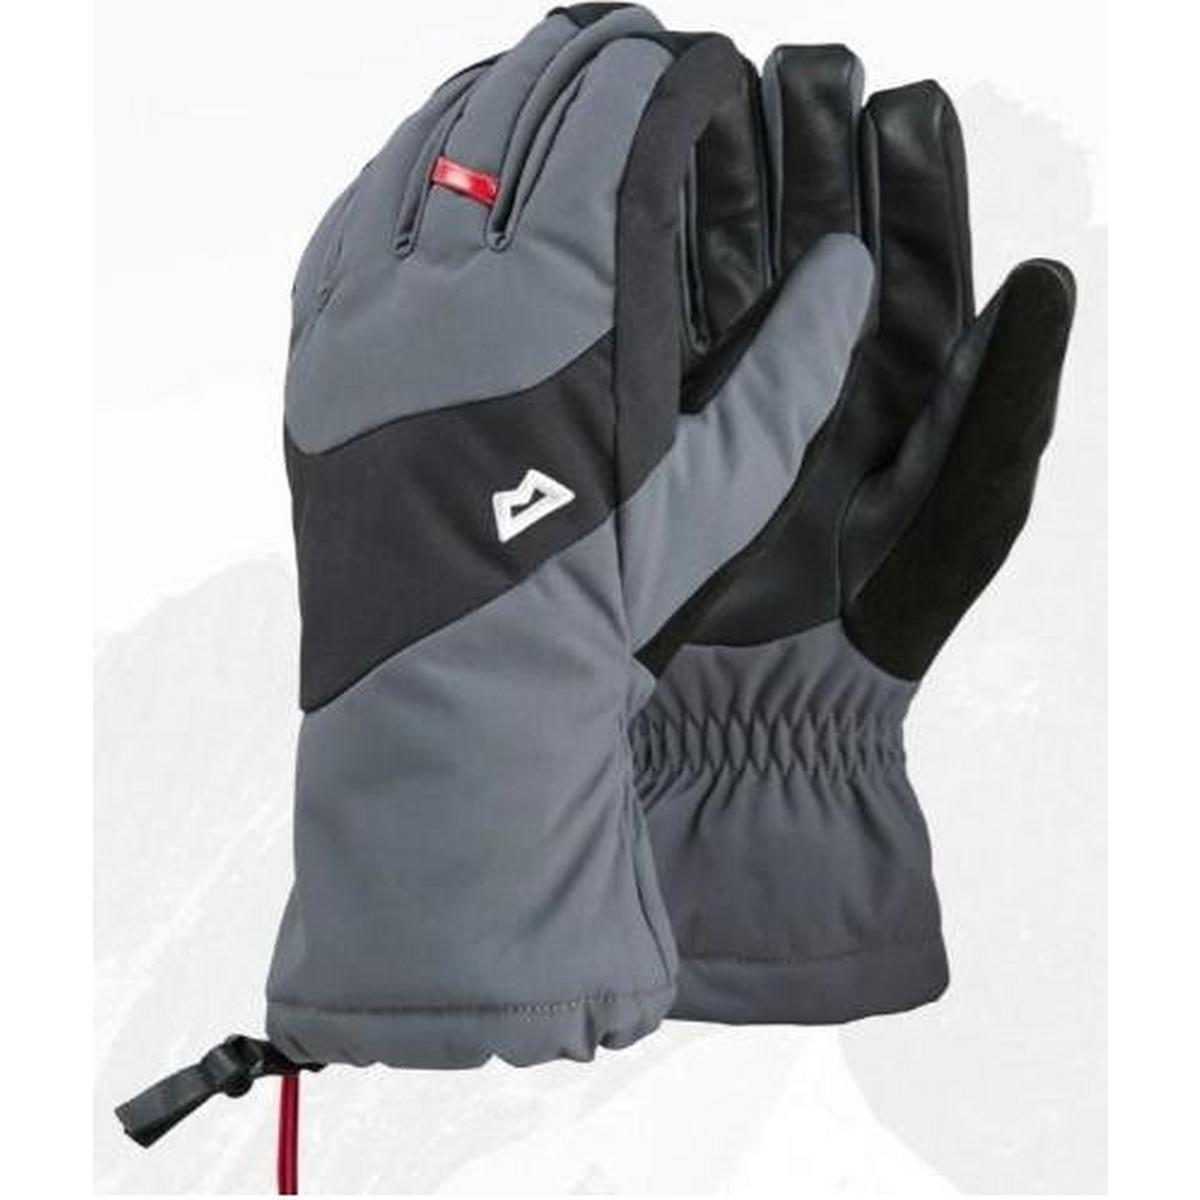 Mountain Equipment Men's Mountain Equipment Guide Glove - Black